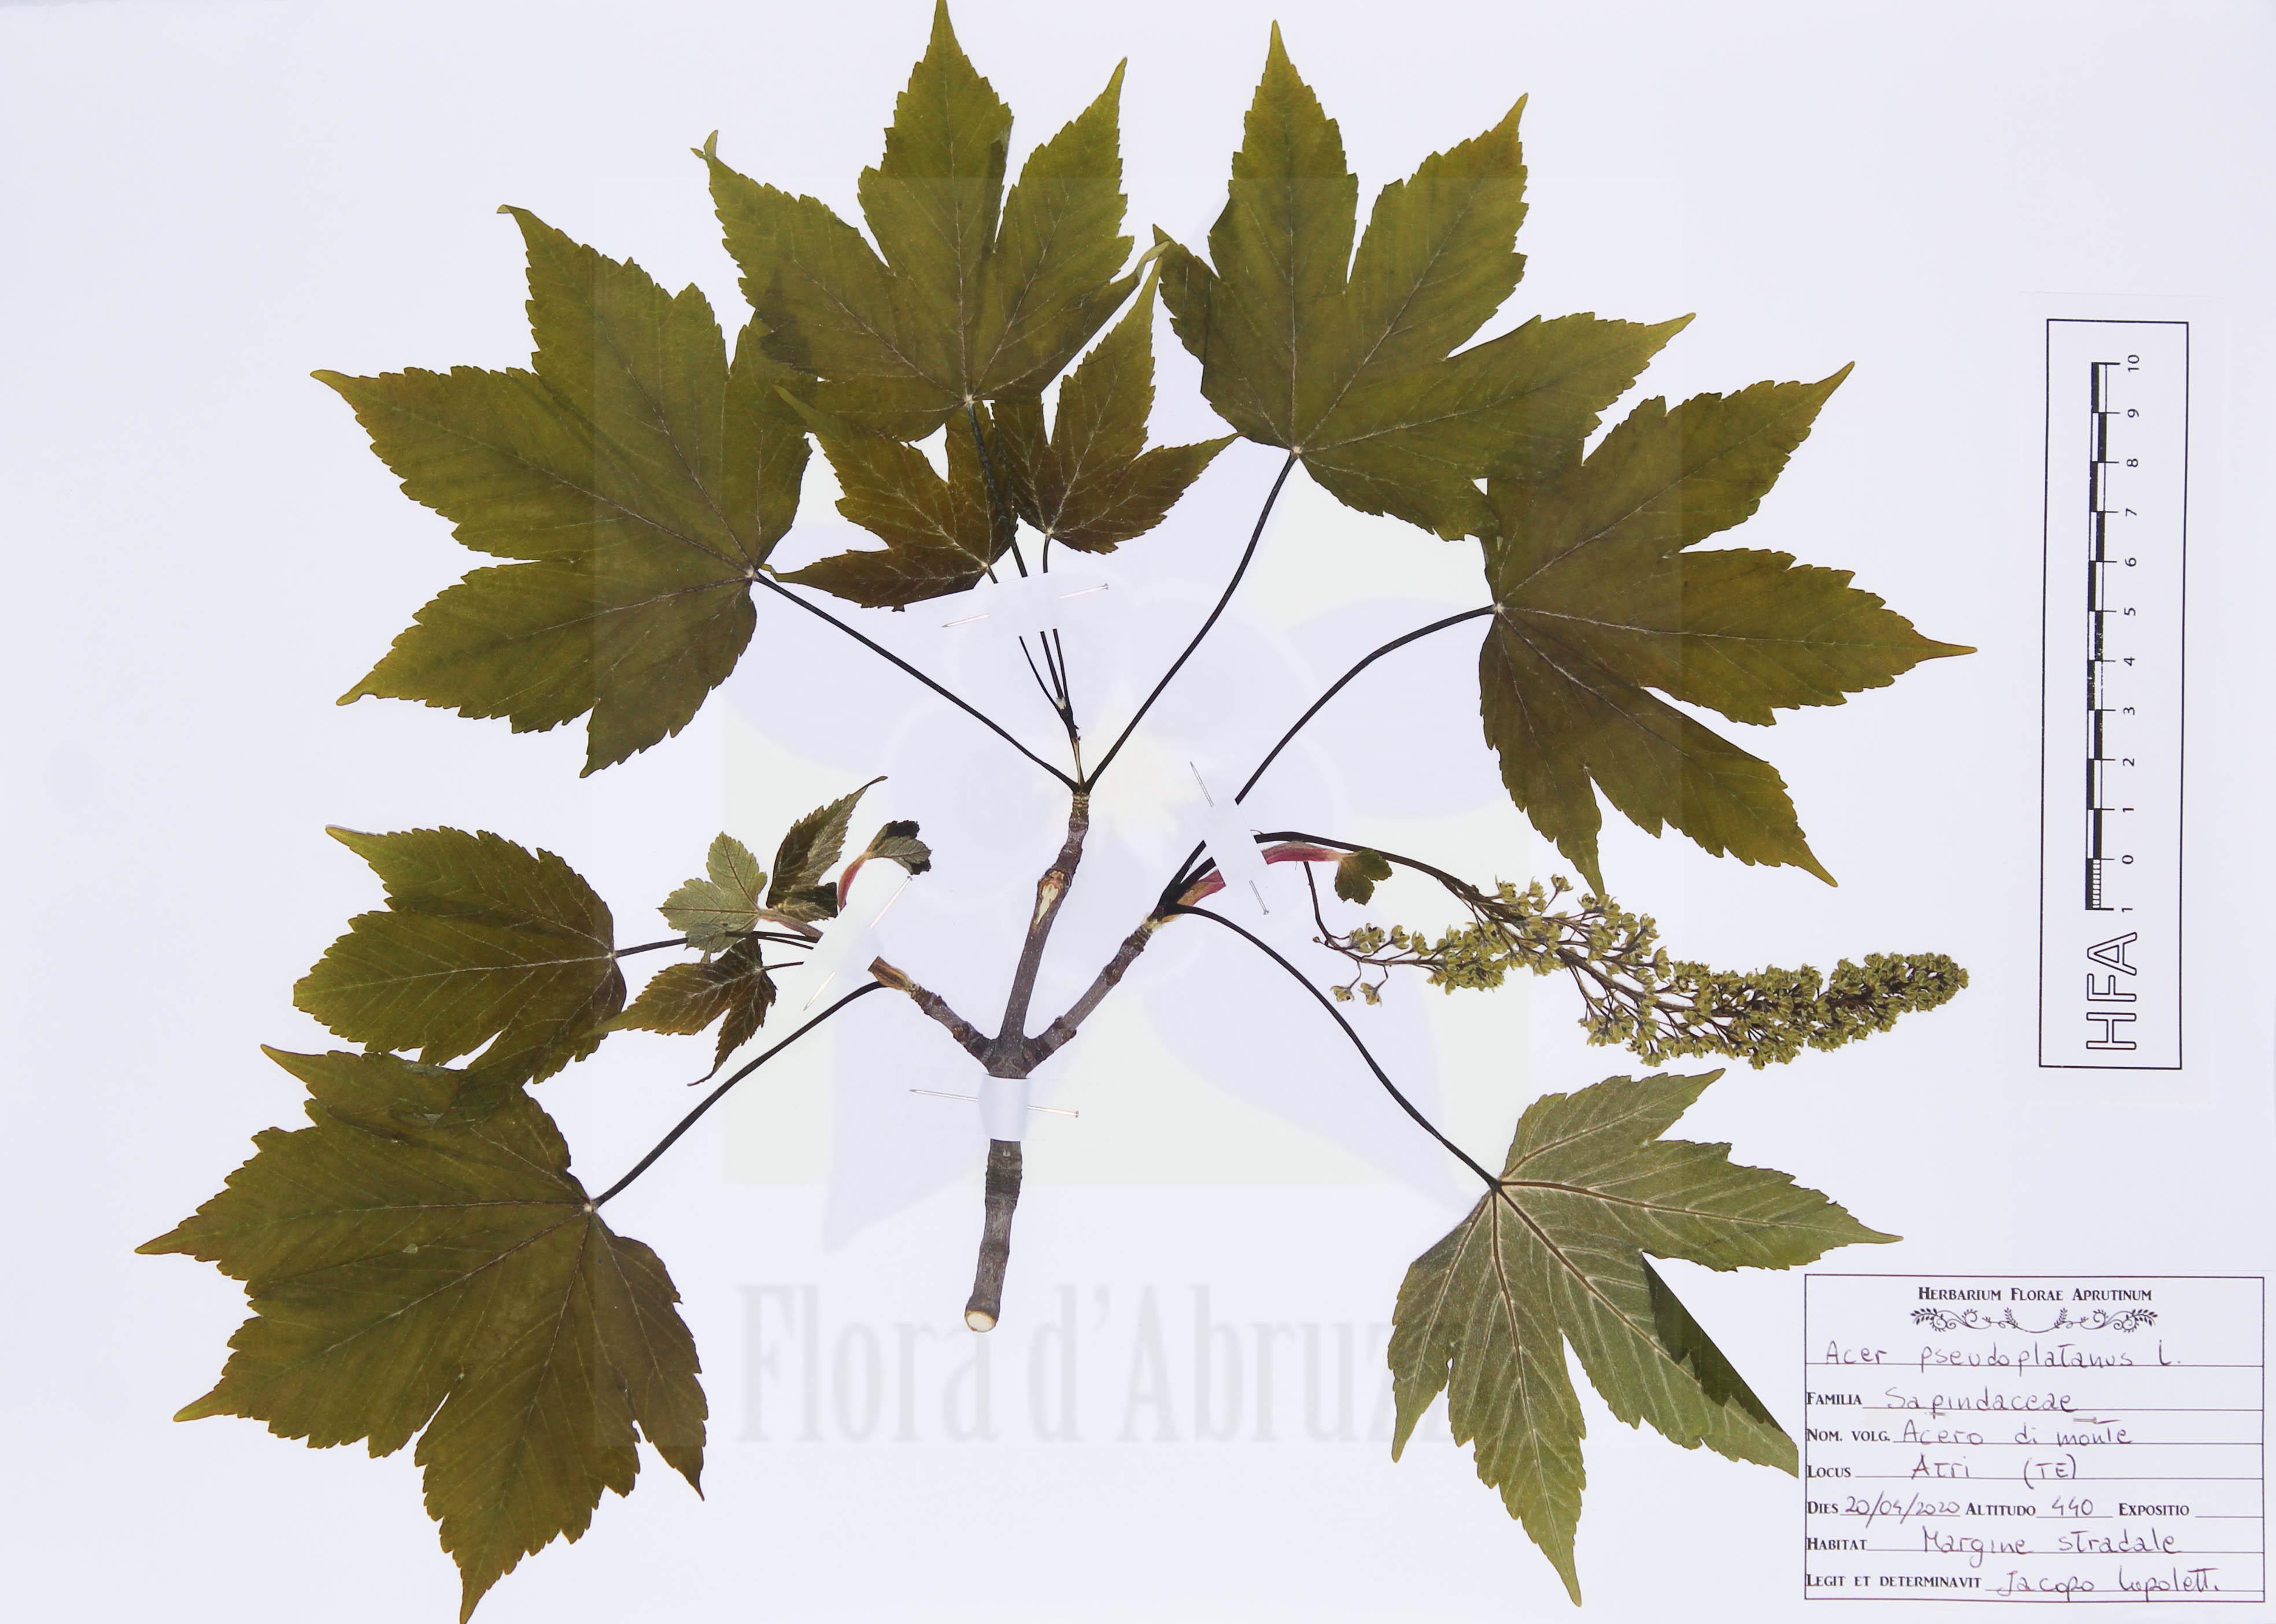 Acer pseudoplatanusL